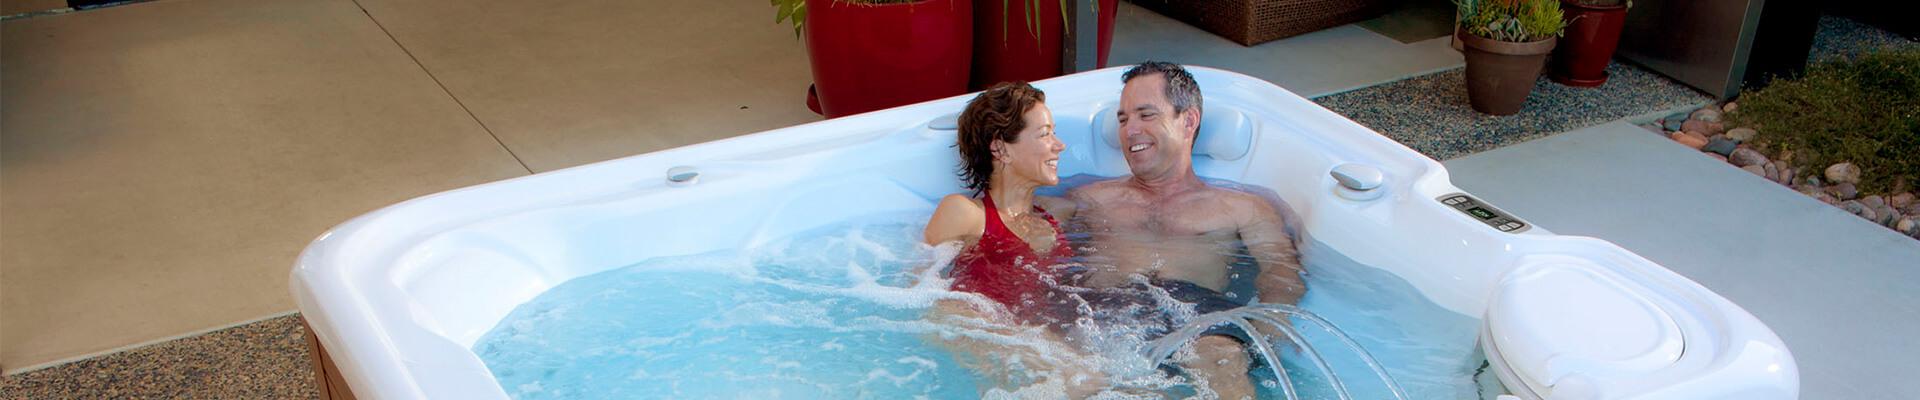 How to Detail Your Spa – Hot Tub Repair, Service Portland, Swim Spas